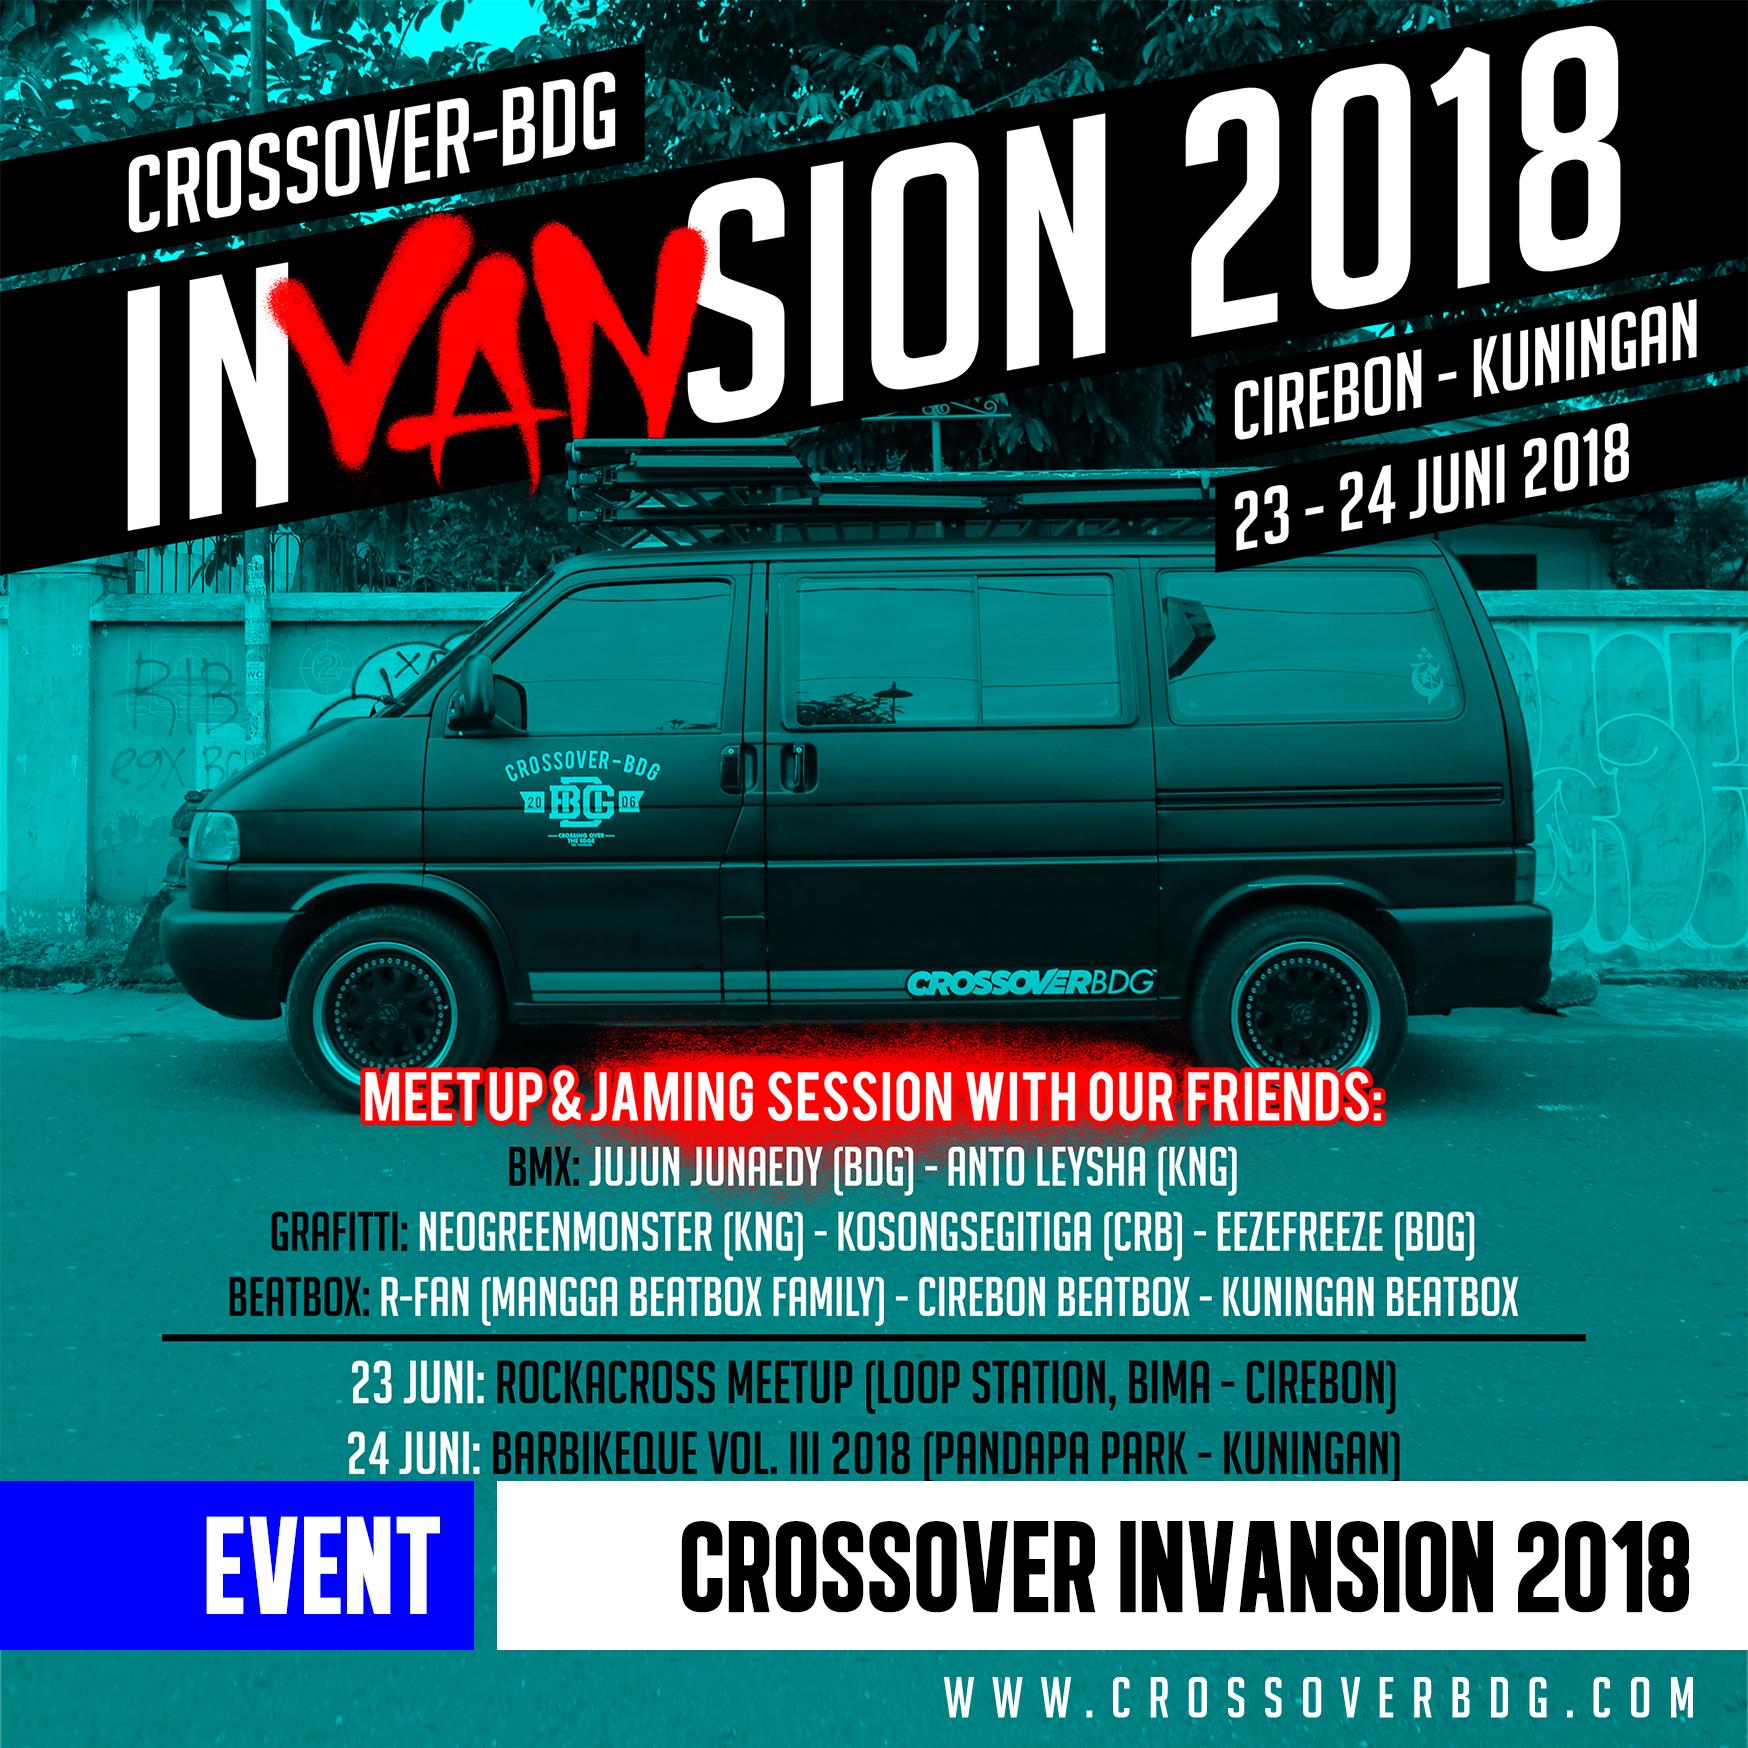 EVENT : Crossover InVANsion Tour 2018 Cirebon – Kuningan image